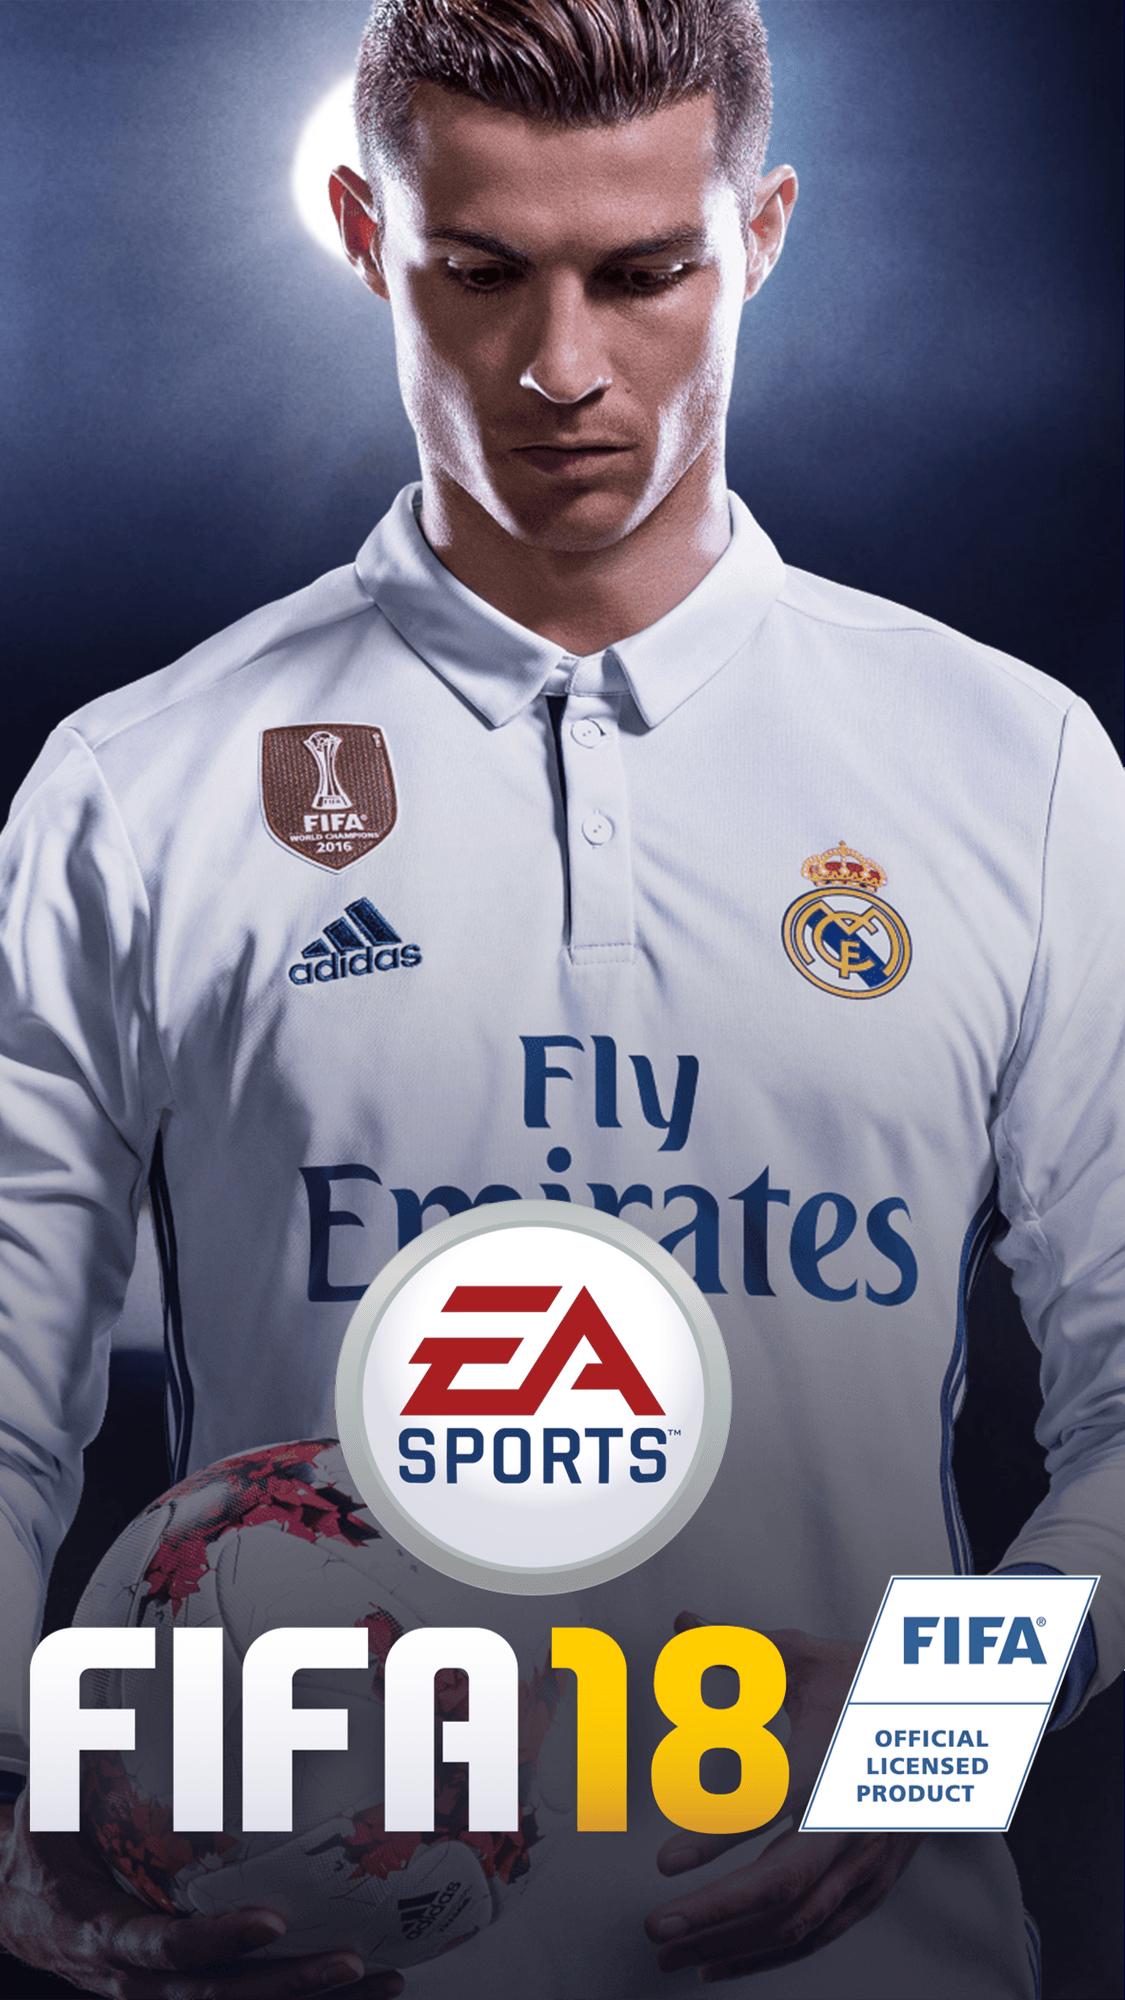 FIFA18 Wallpaper Mobile By Hokage455 On DeviantArt